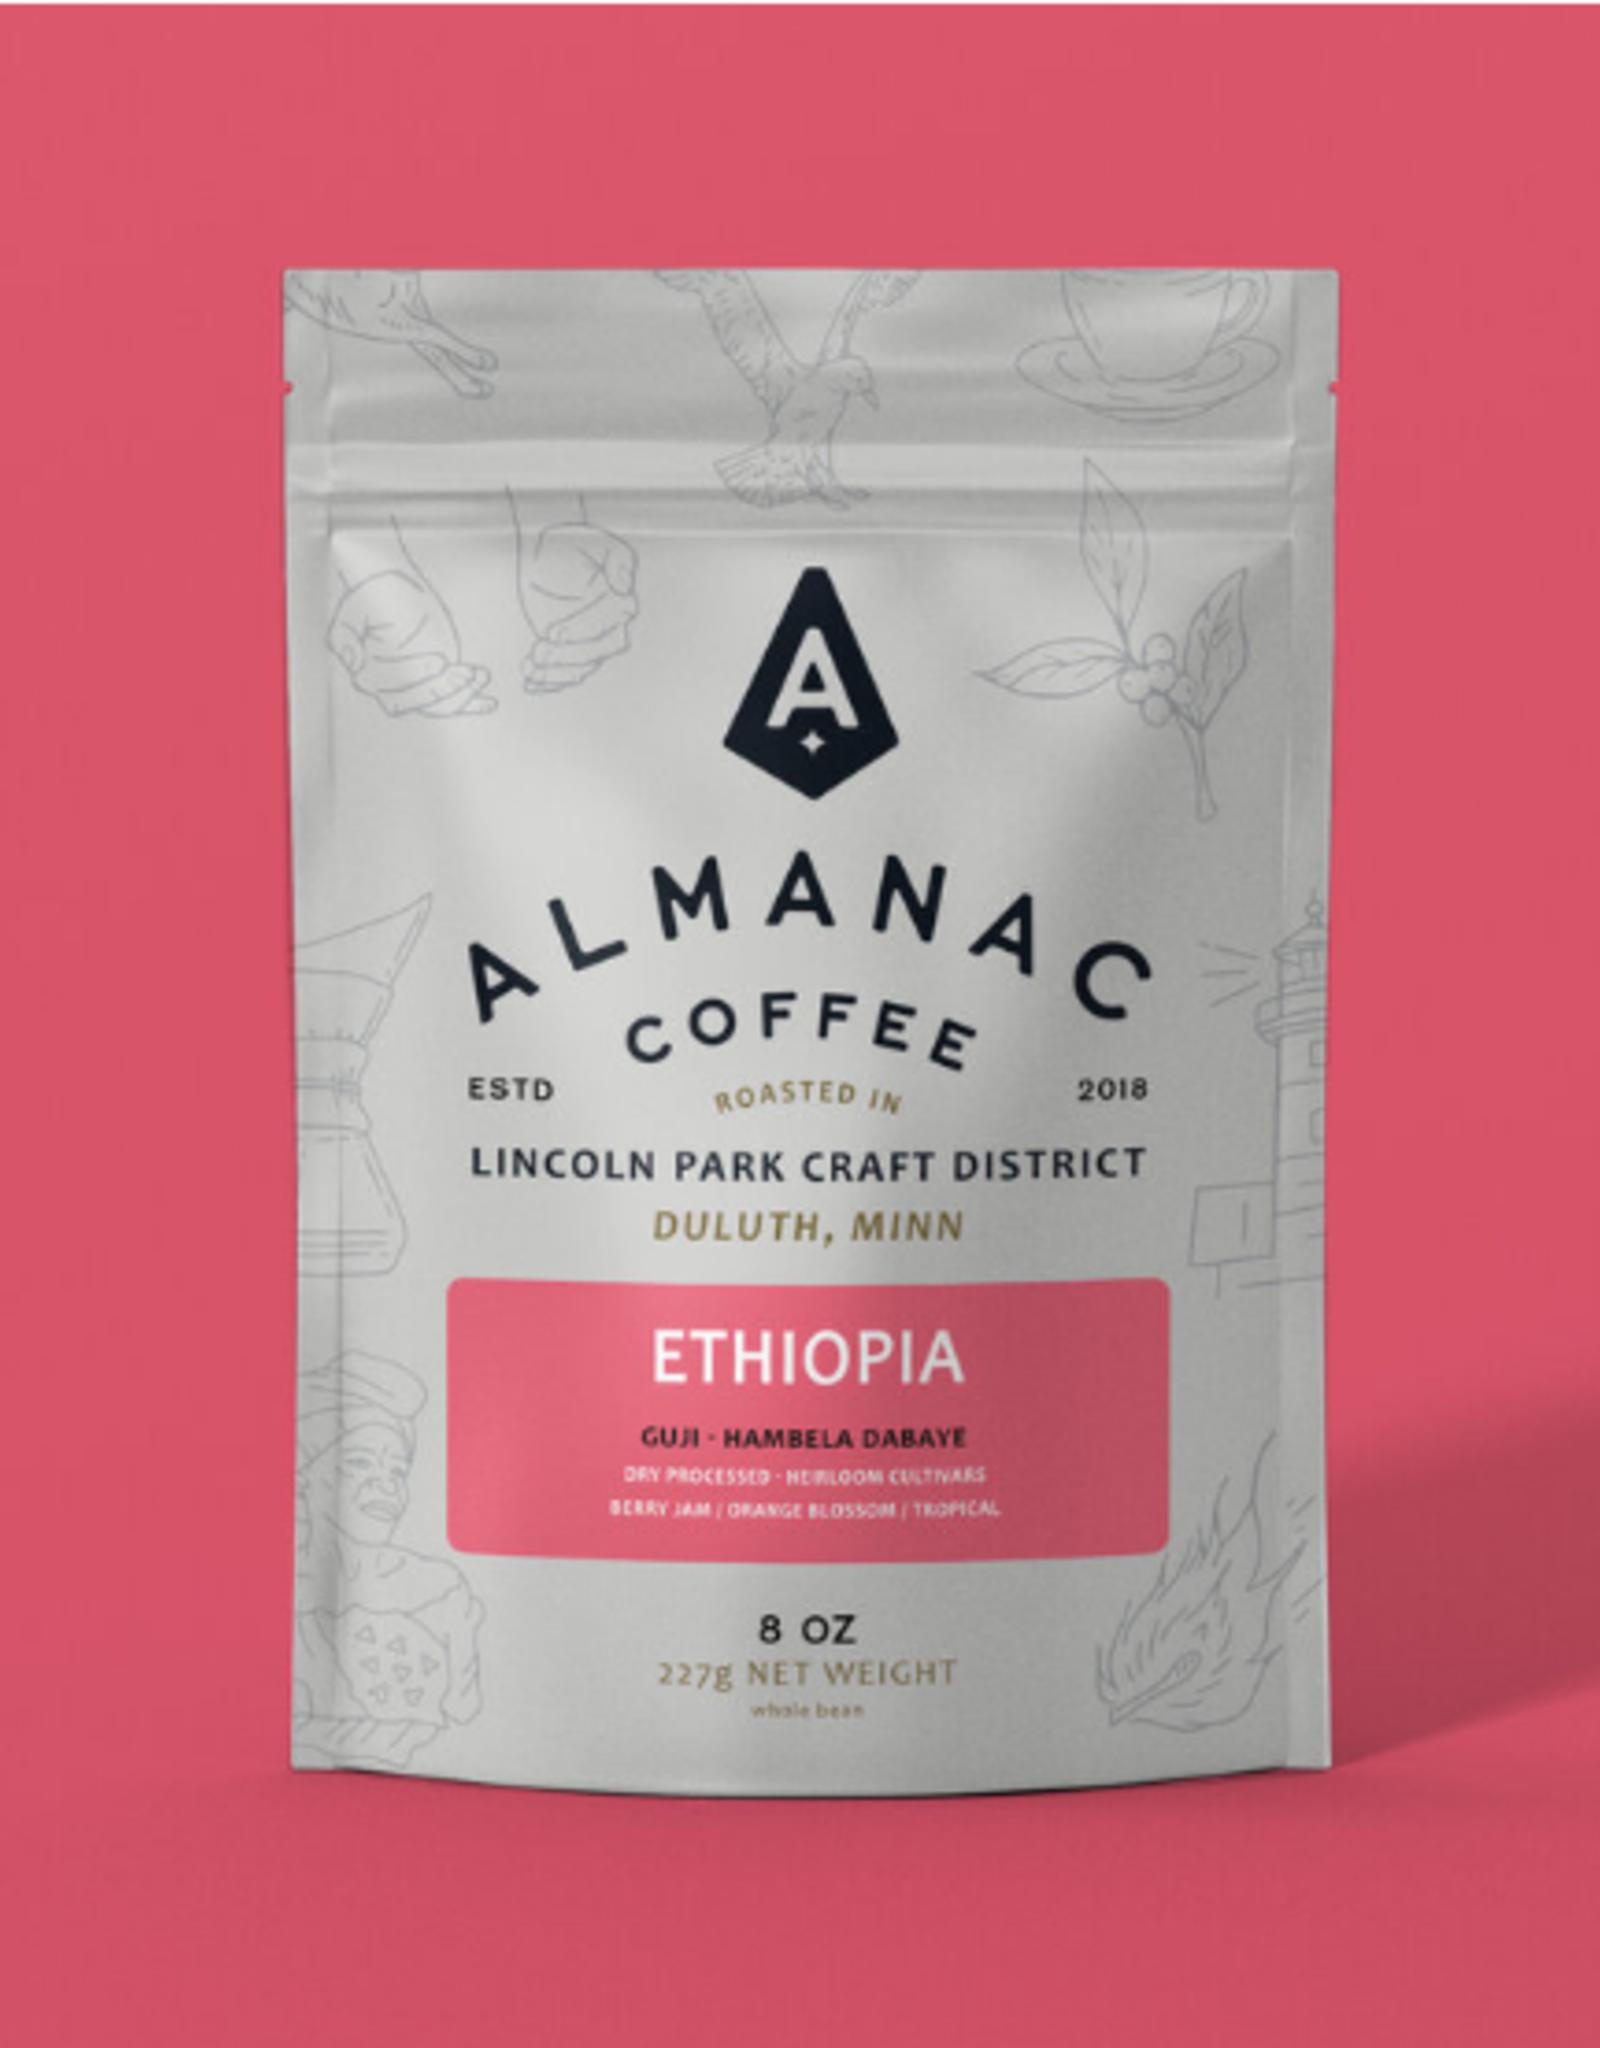 Almanac Coffee Almanac Coffee, Ethiopia